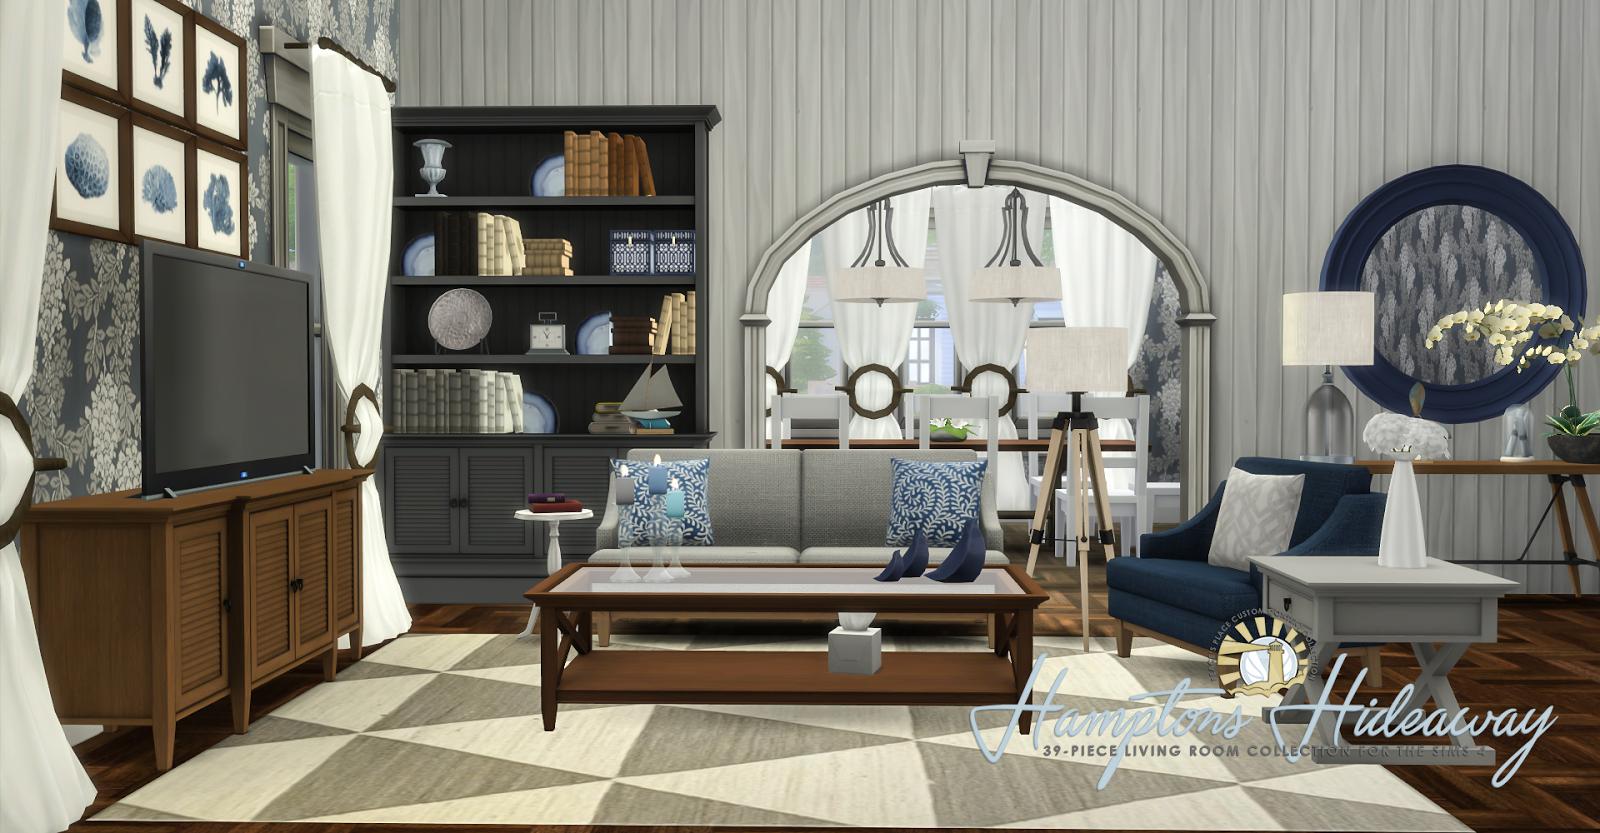 Simsational Designs Hamptons Hideaway  Living Room Set